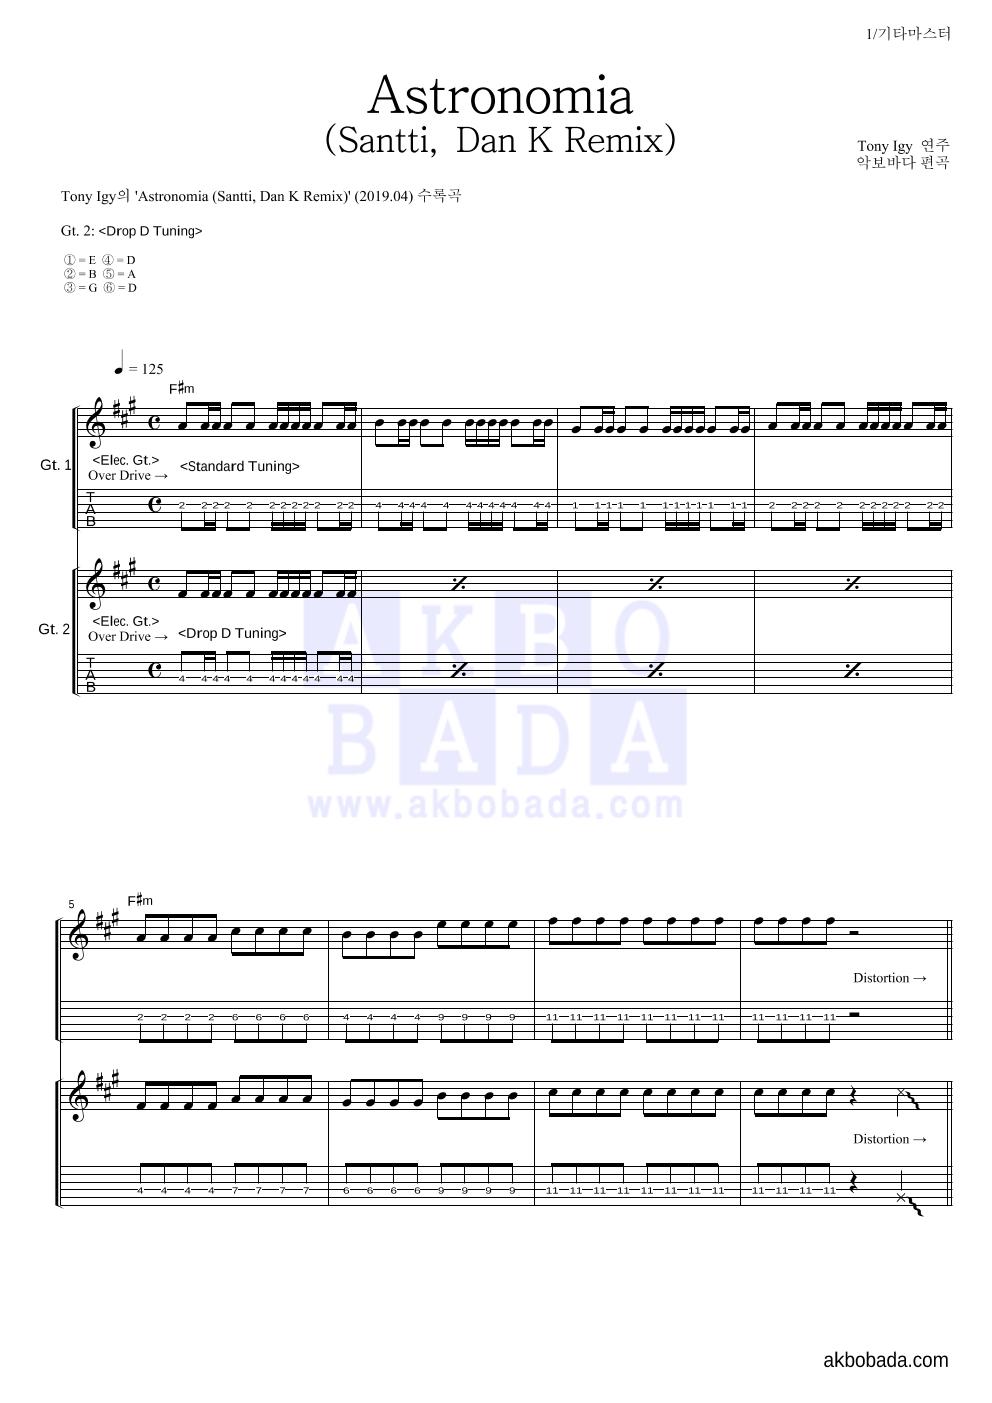 Tony Igy Astronomia(Santti, Dan K Remix)(관짝춤) 악보